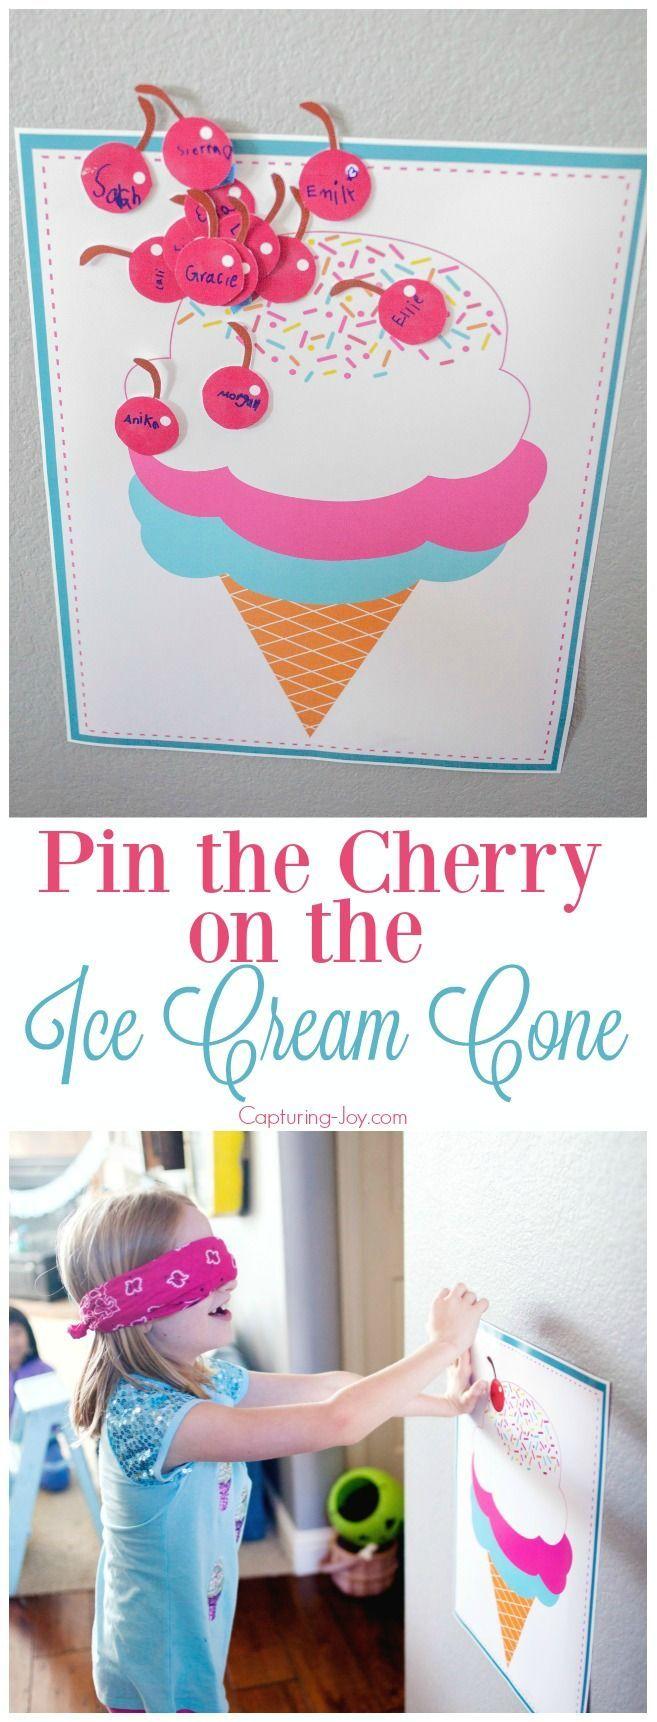 Pin the Cherry on the Ice Cream Cone Activity - Fun birthday party activity. Cap...